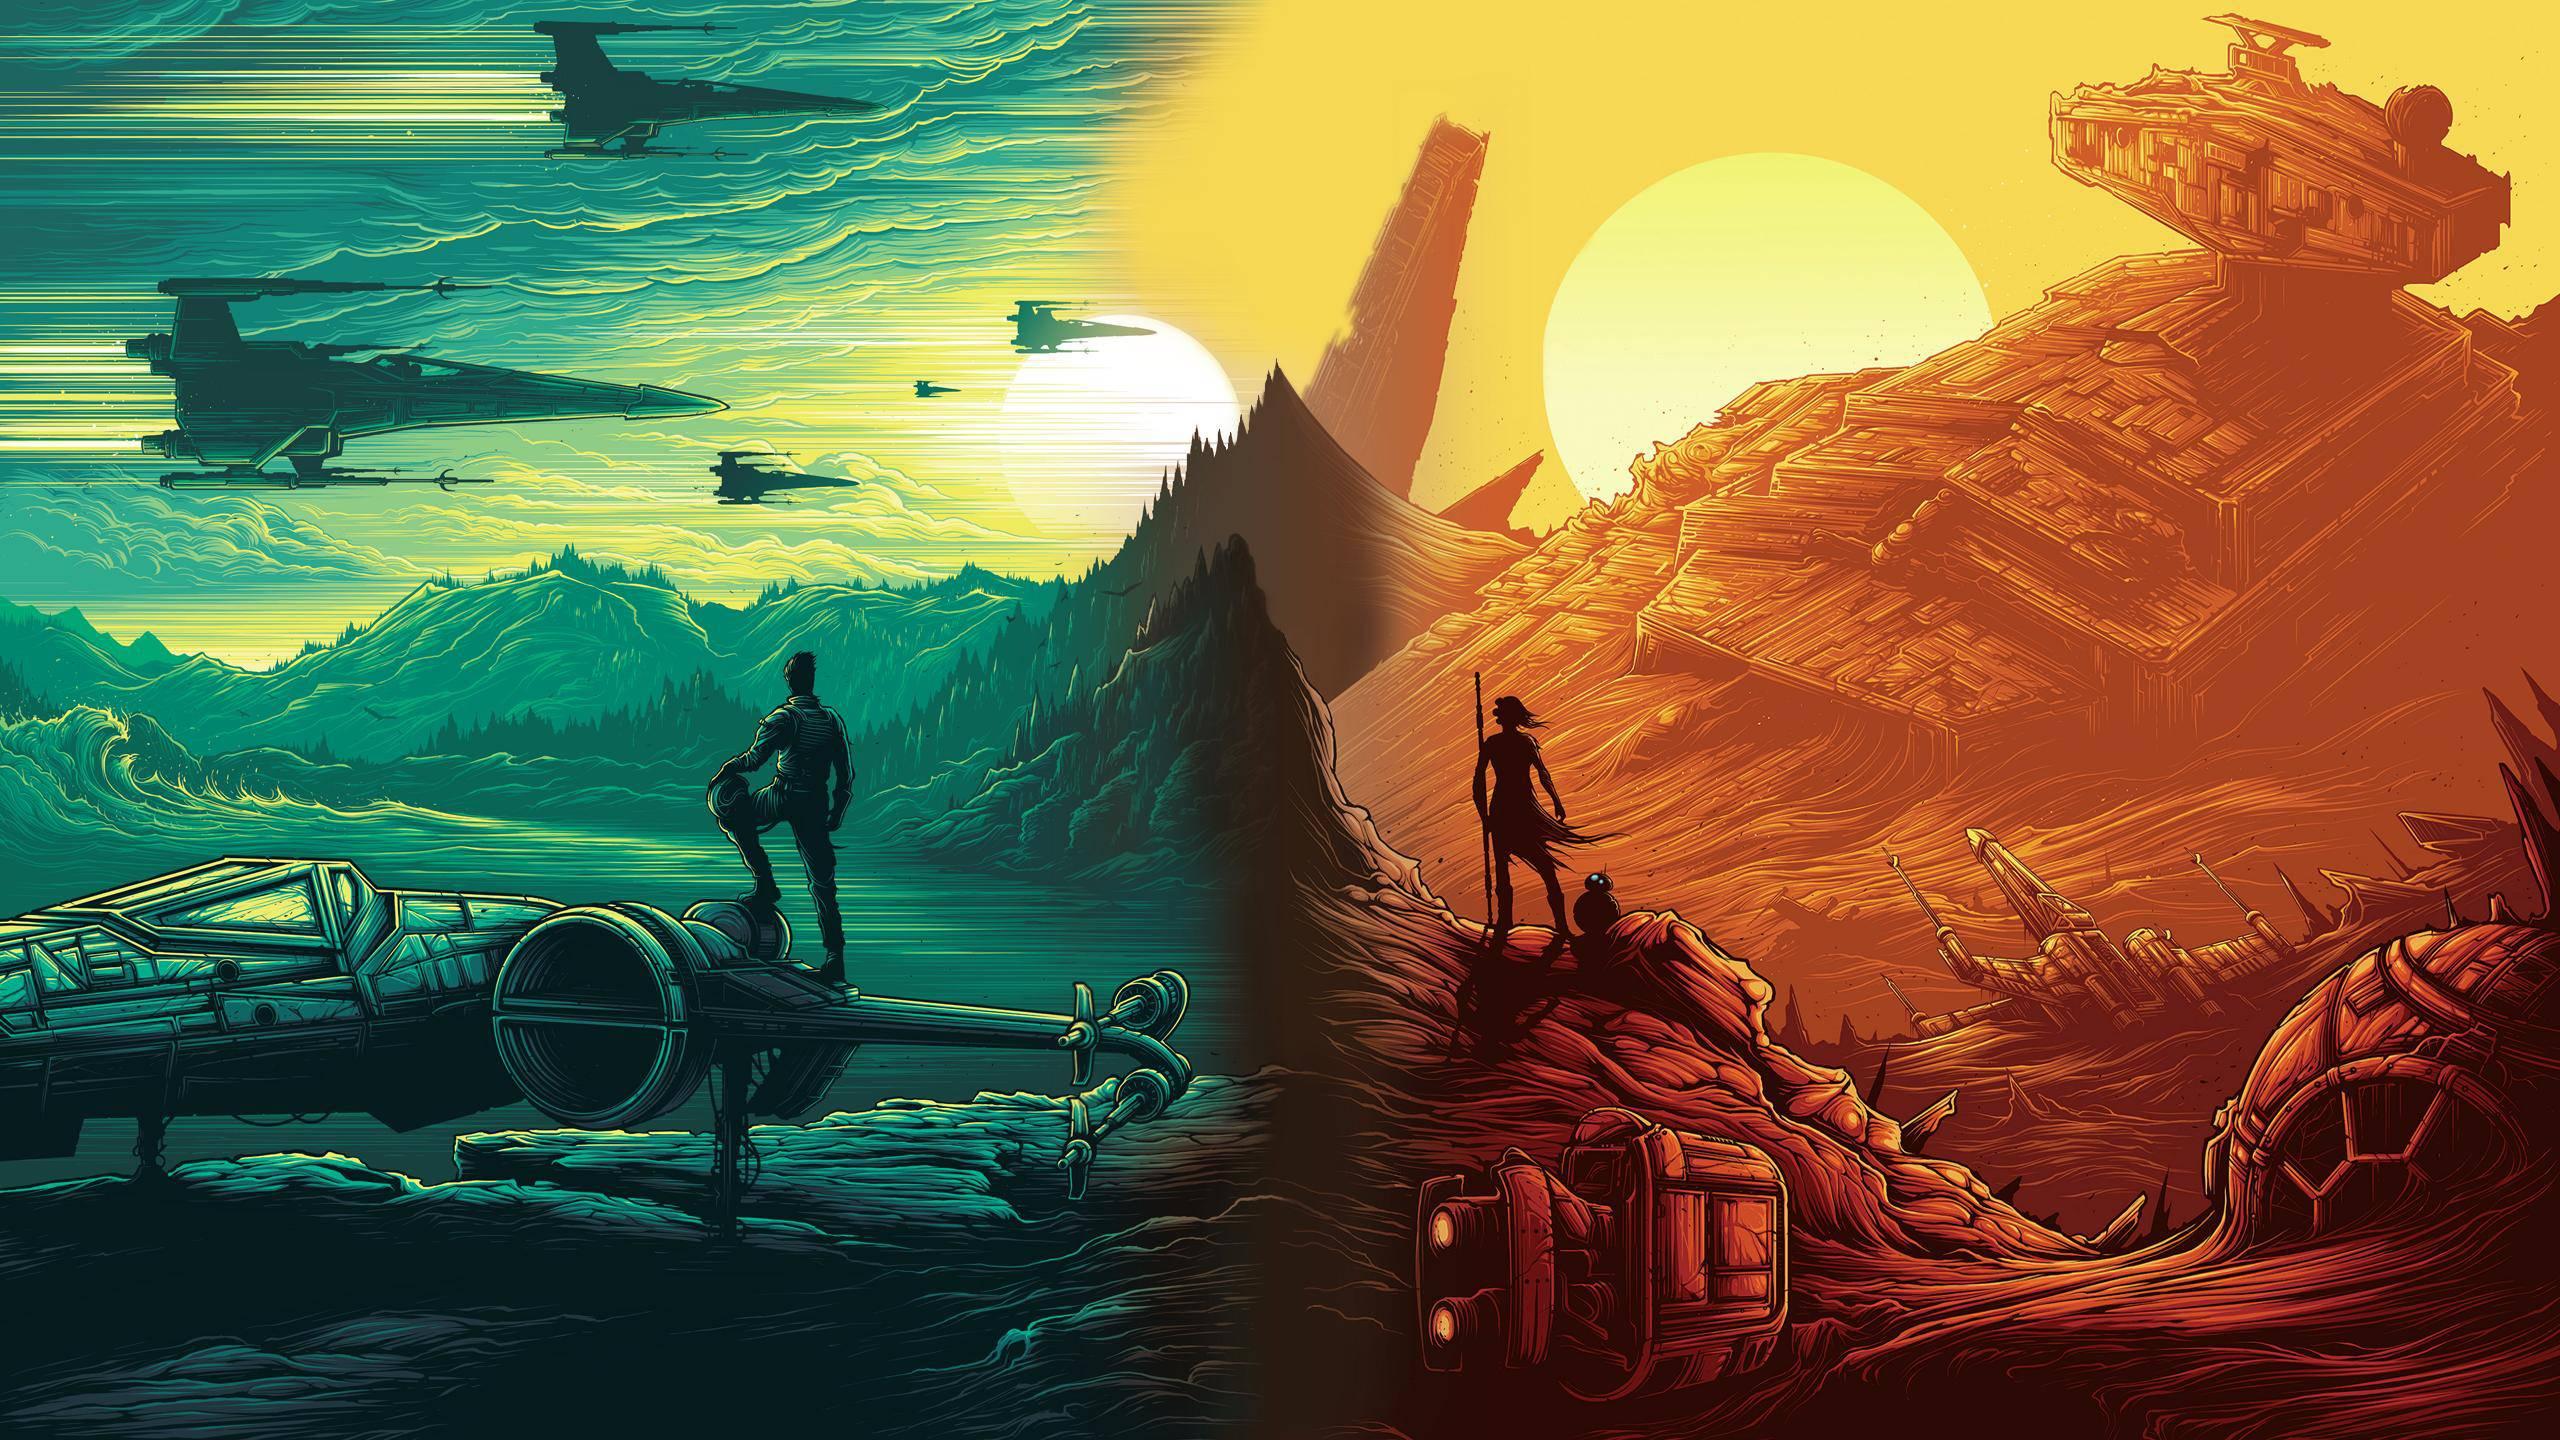 43 Reddit Star Wars Wallpaper On Wallpapersafari